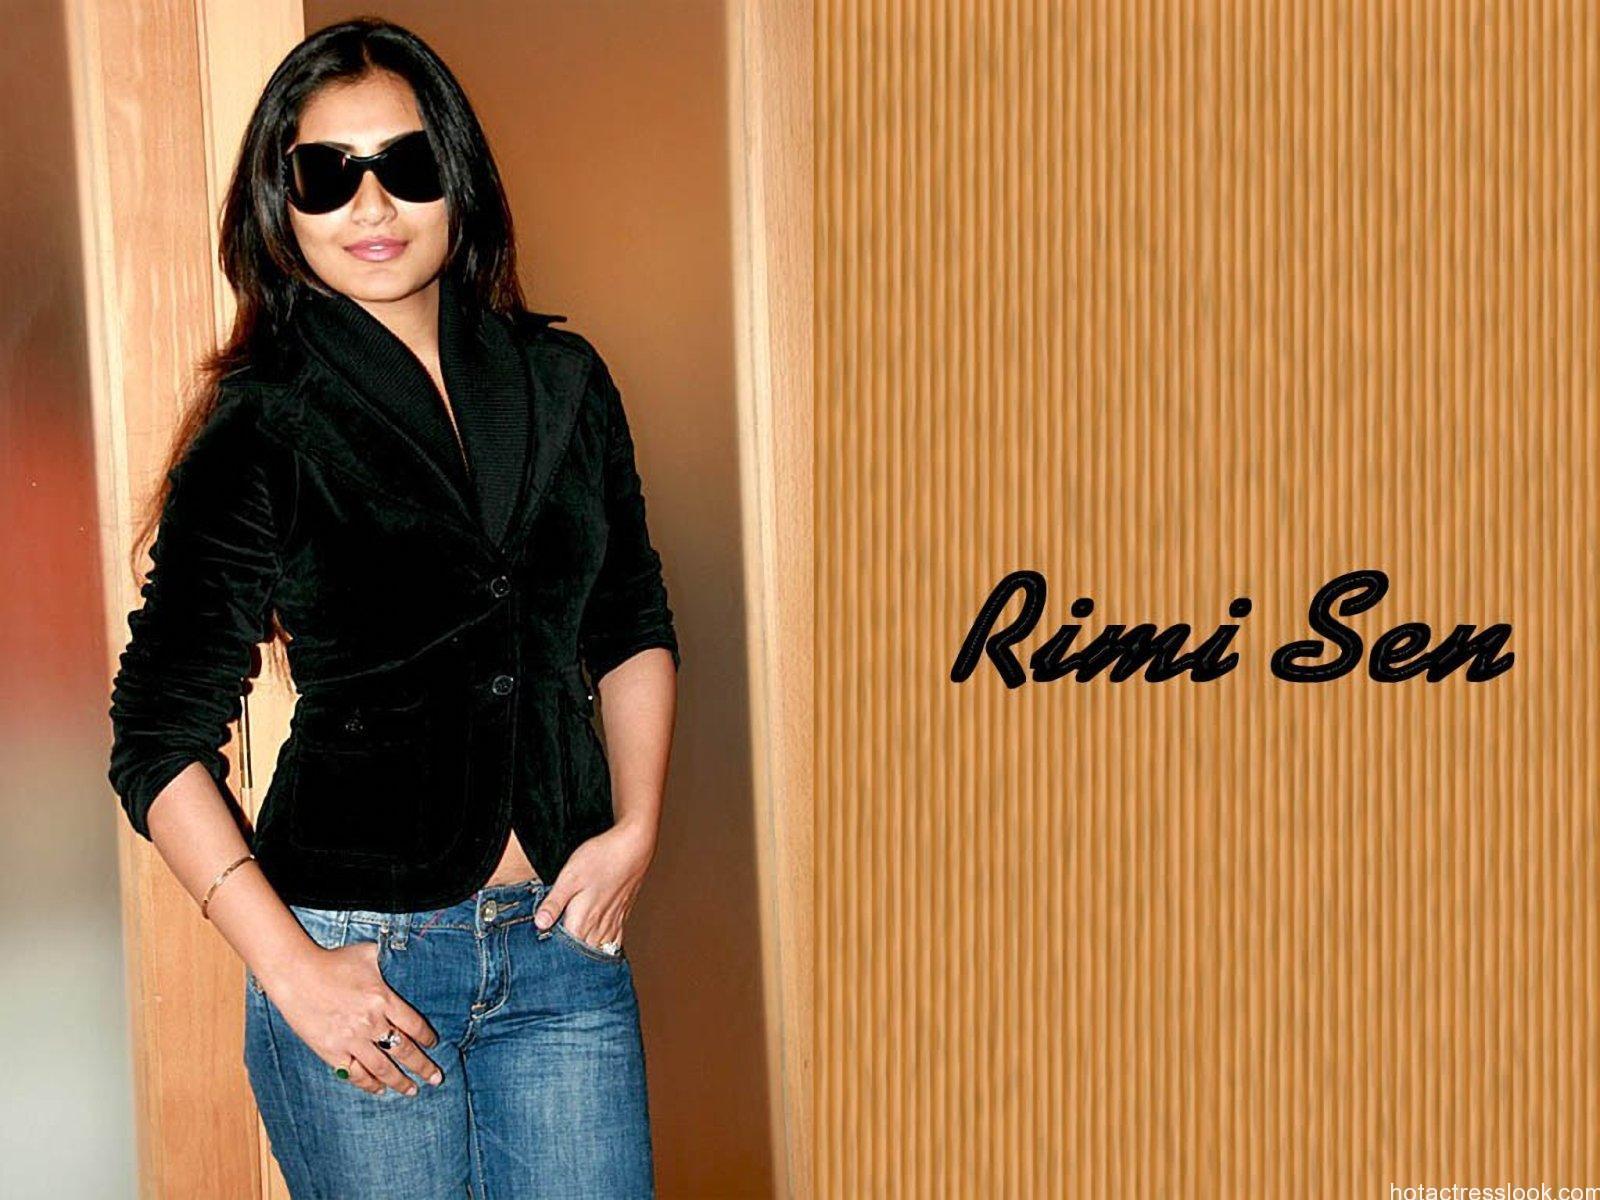 Rimi Sen Hot And Beautiful Wallpapers